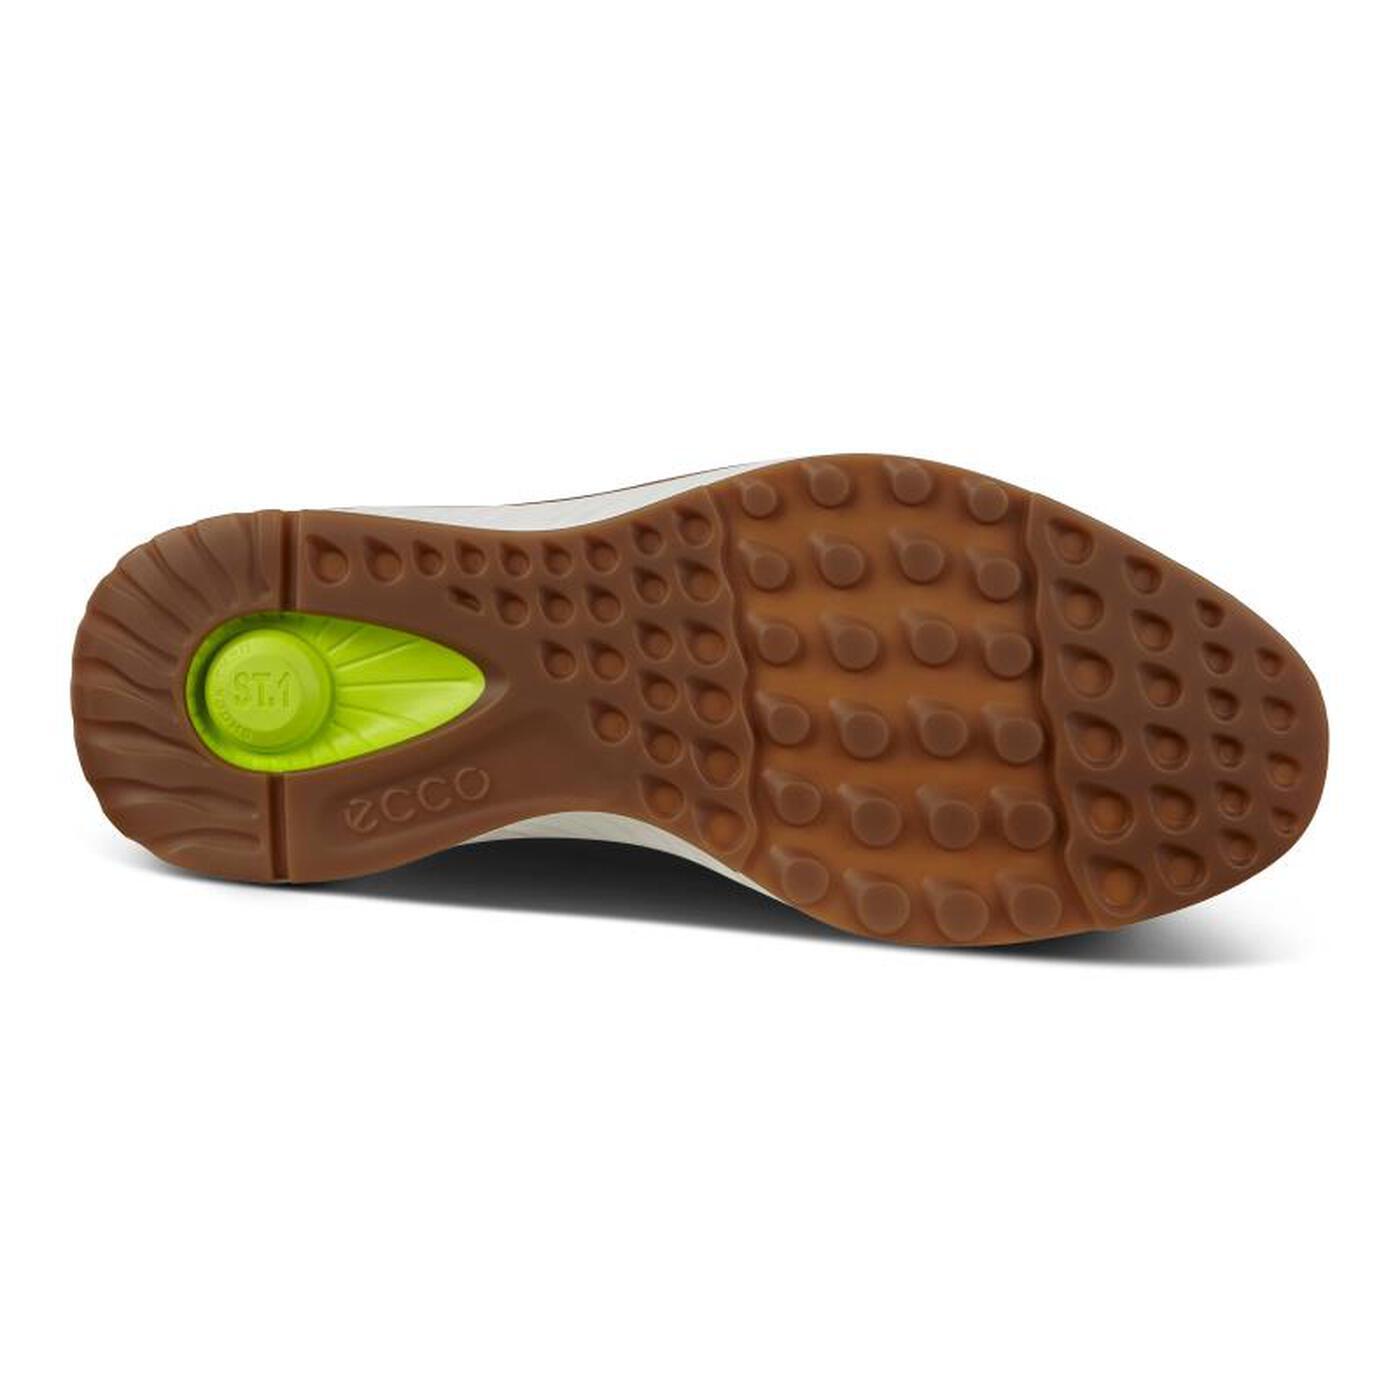 ECCO ST.1 Hybrid Shoe